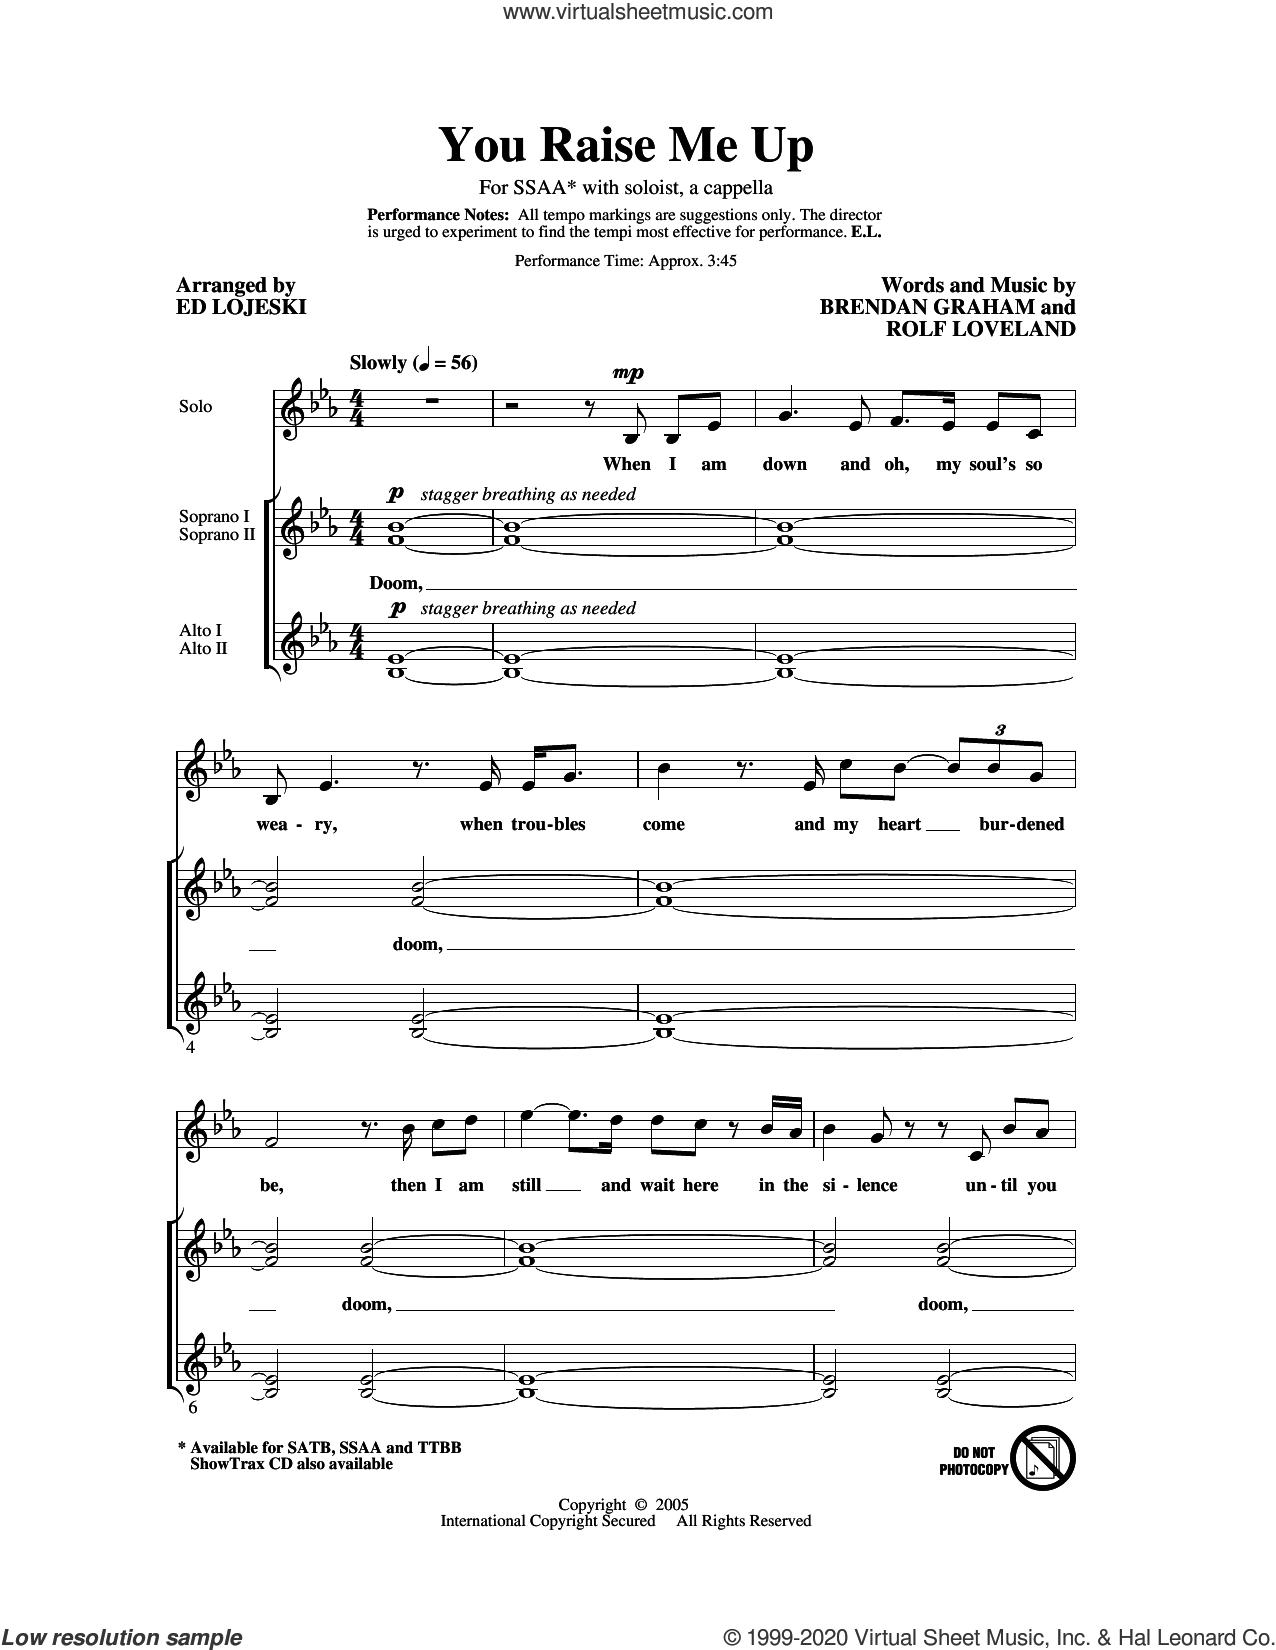 You Raise Me Up (arr. Ed Lojeski) sheet music for choir (SSA: soprano, alto) by Josh Groban, Ed Lojeski, Brendan Graham and Rolf Lovland, intermediate skill level